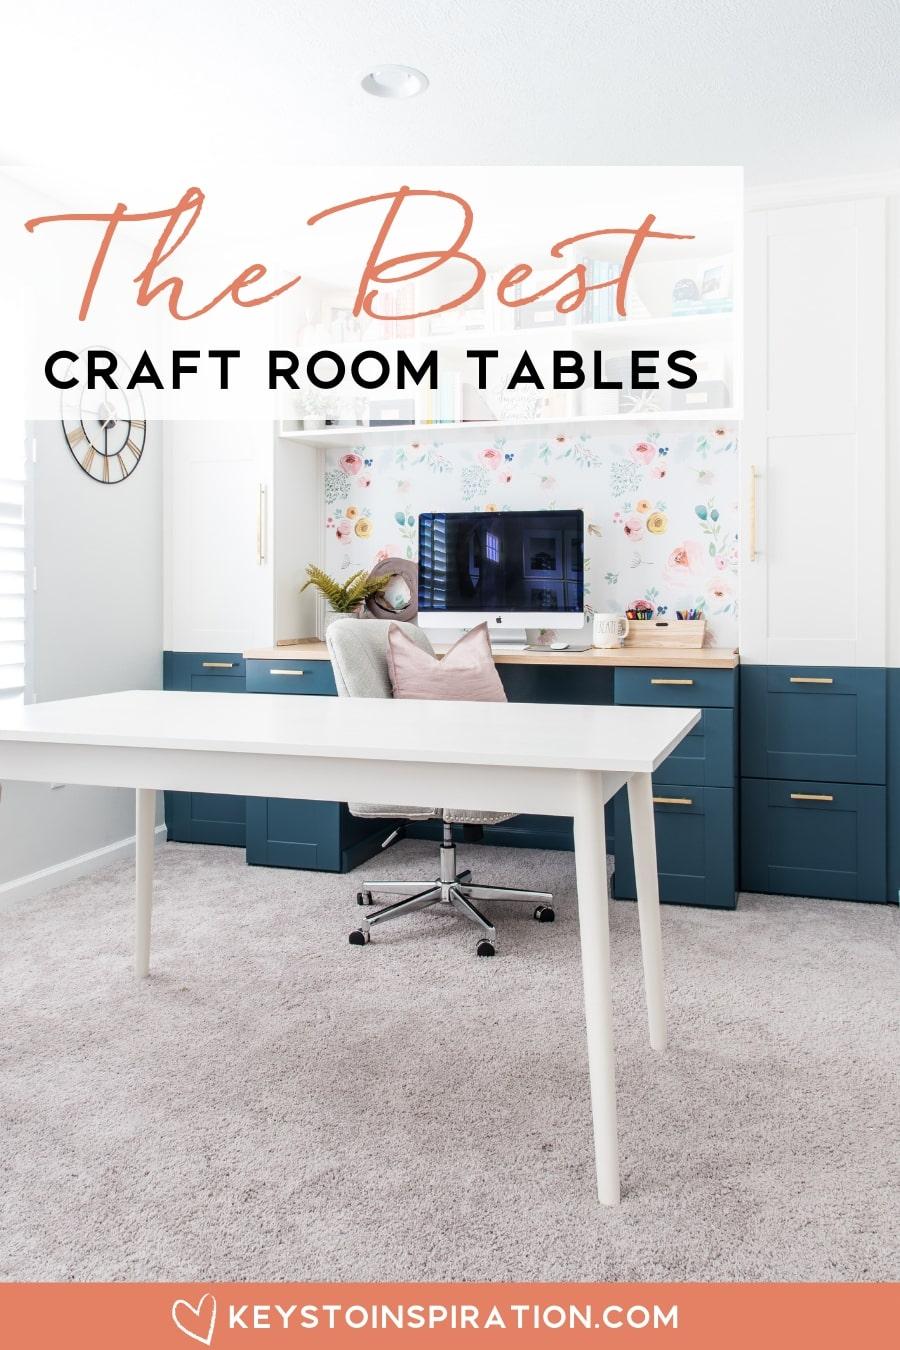 The Best Craft Room Tables Christene Holder